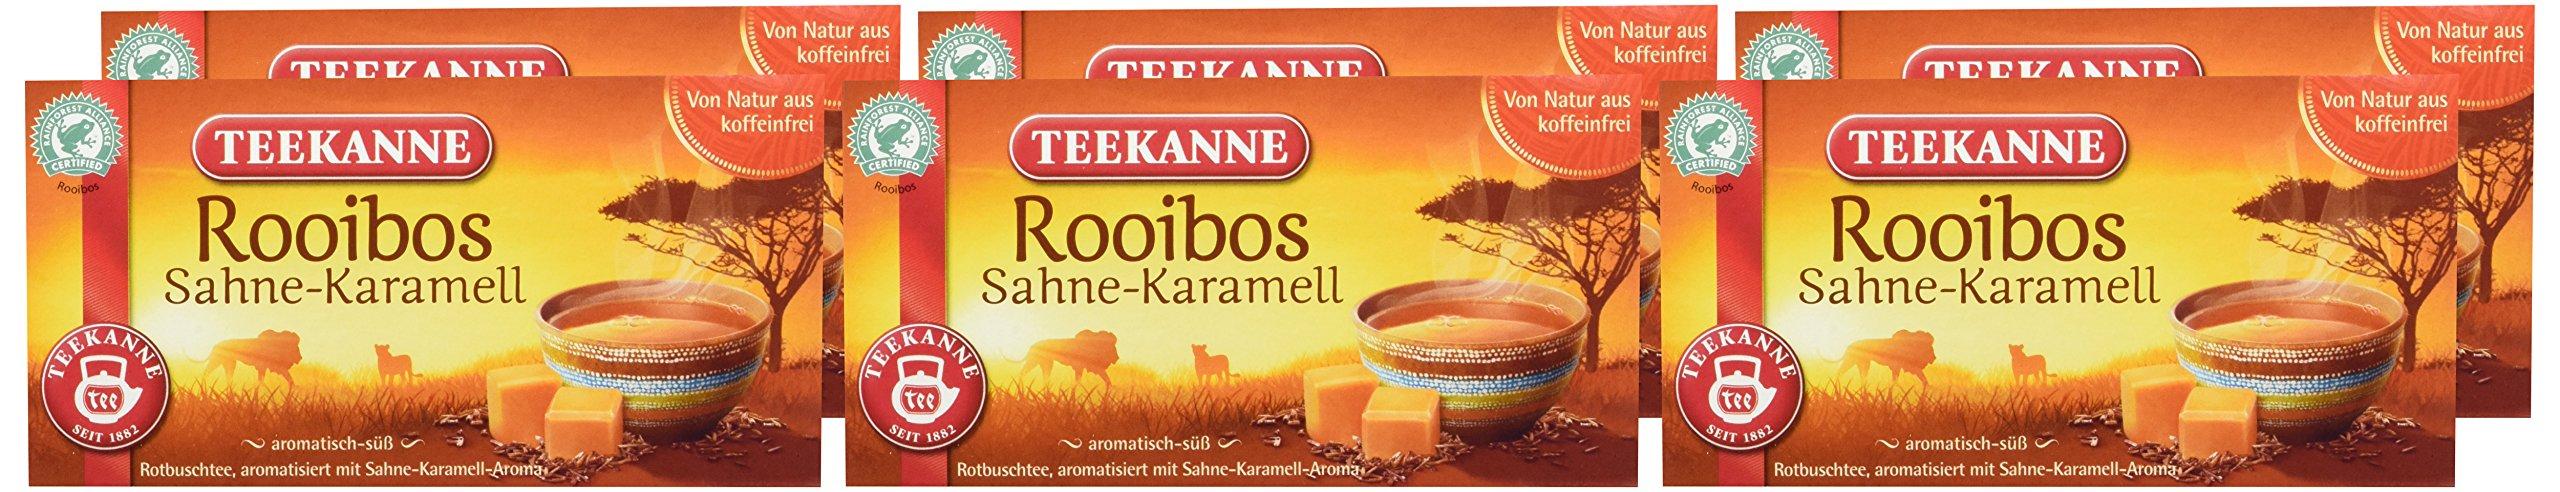 Teekanne-Rooibos-Sahne-Karamell-6er-Pack-6-x-35-g